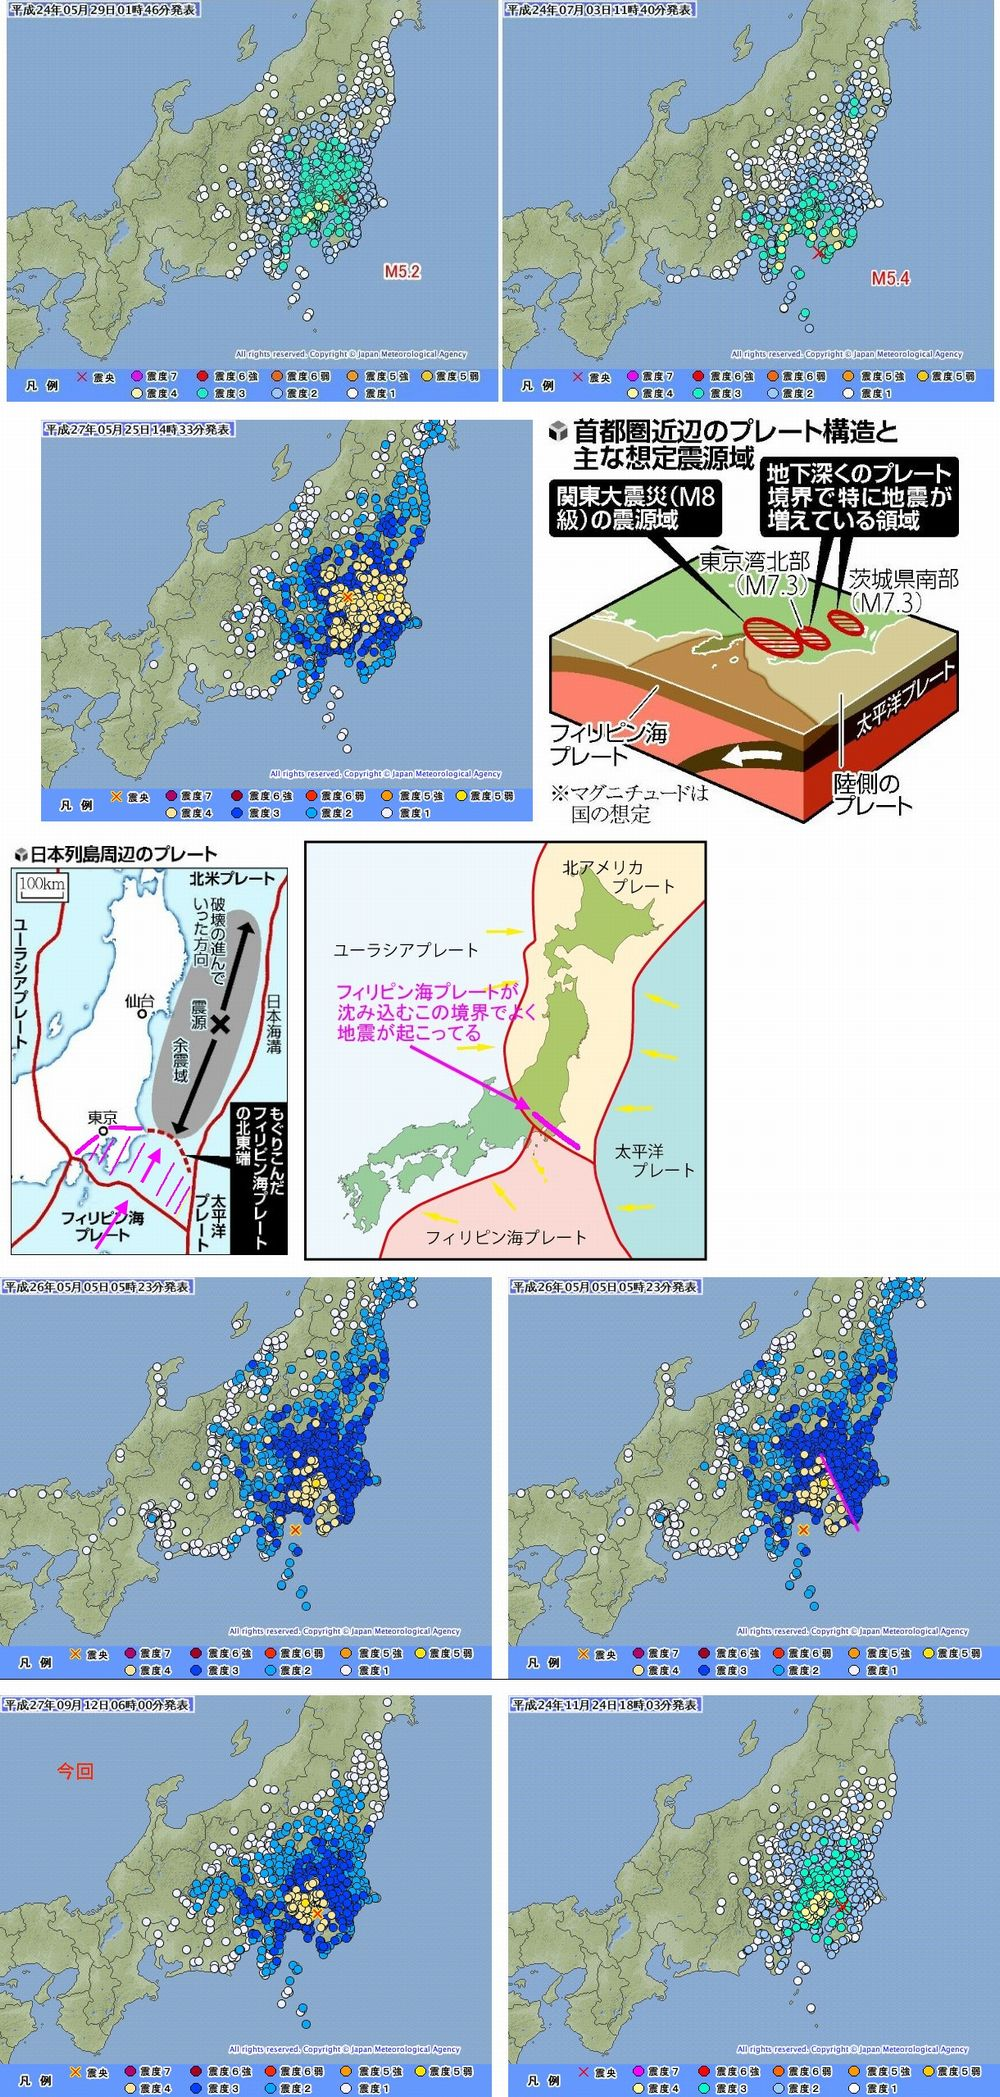 http://blog-imgs-81.fc2.com/o/k/a/okarutojishinyogen/newsplus_1442065953_33301.jpg